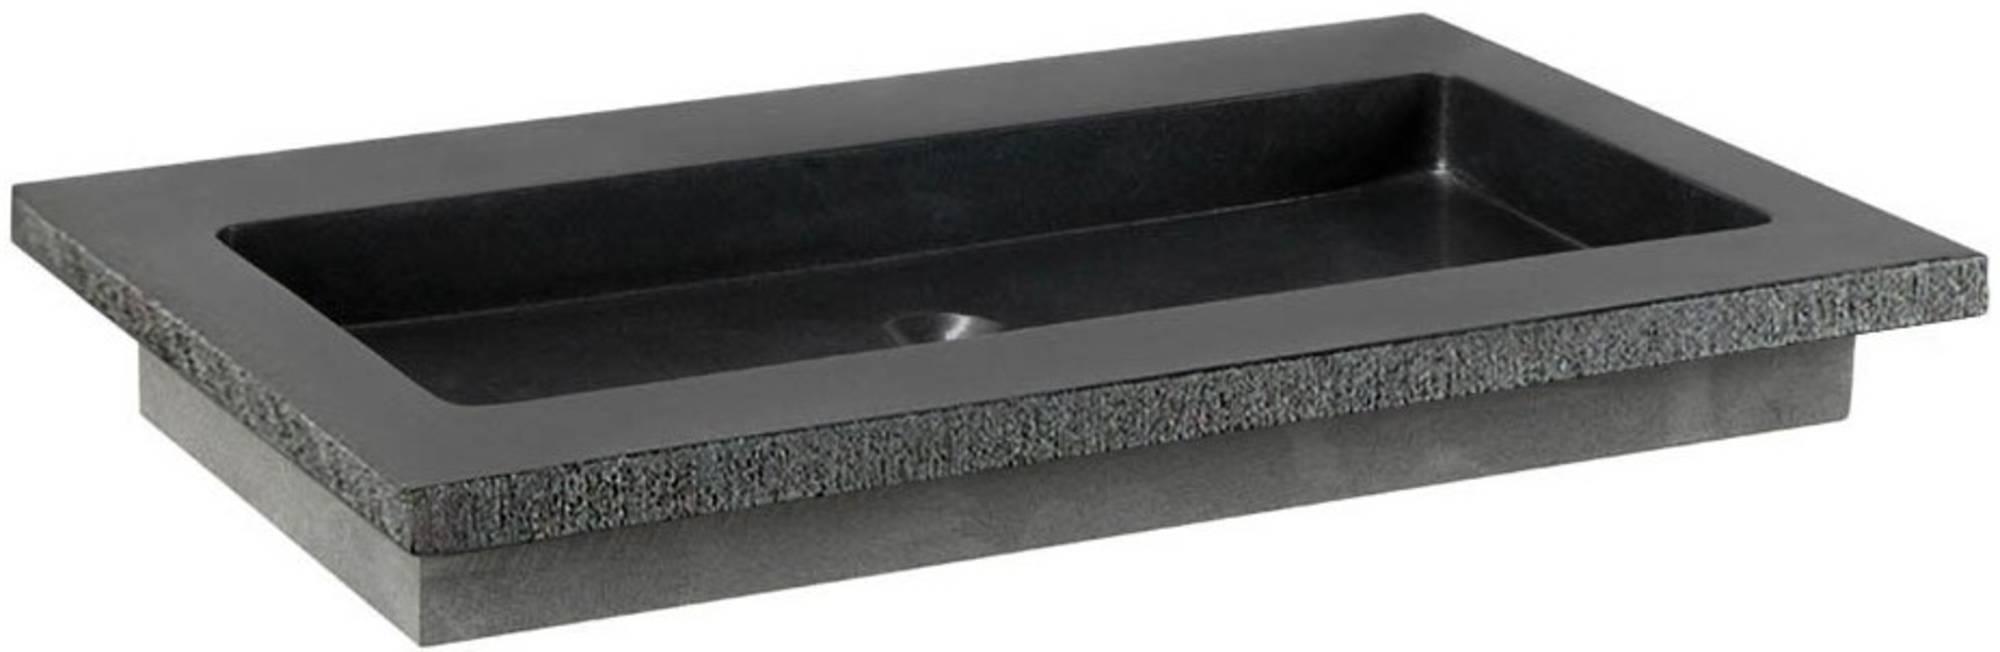 Ben Naturno Wastafel Graniet Gezoet Gefrijnd 80,5x51,5x3 cm 1 Krg. Zwart